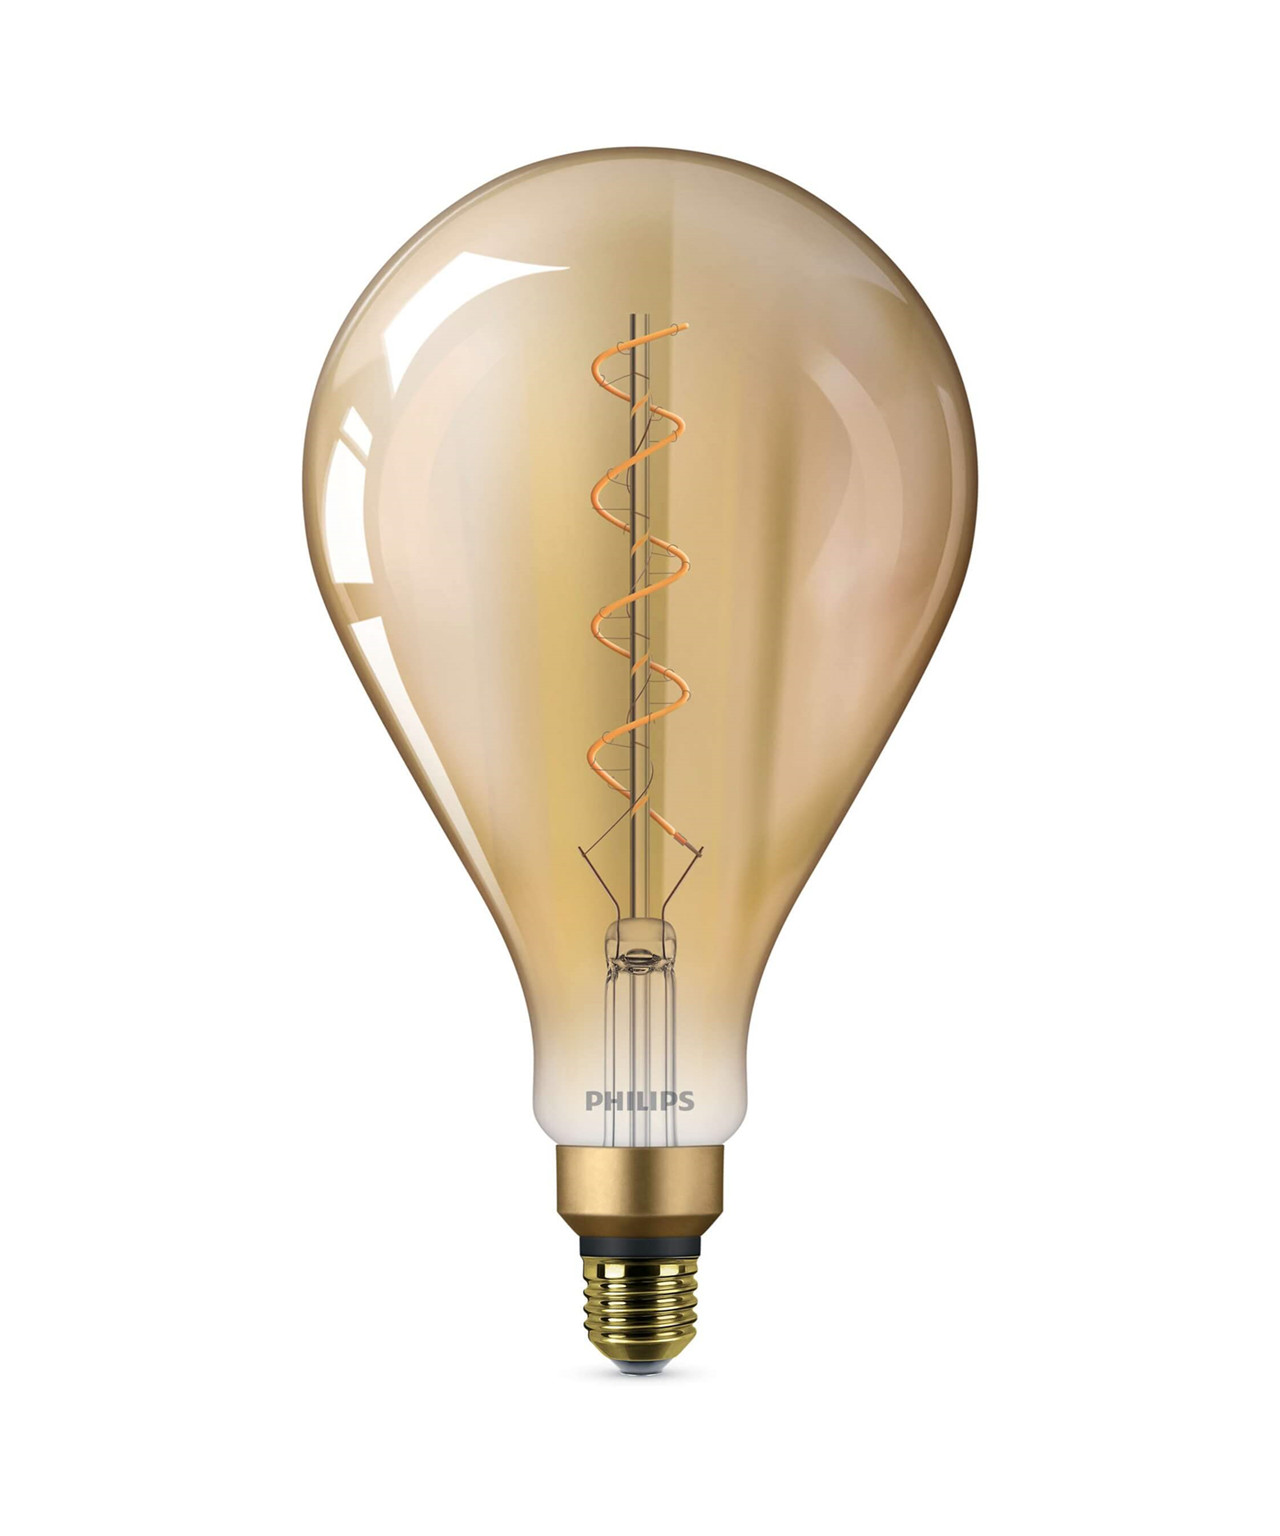 Pære LED 5W Classic Globe (300lm) Ø160 E27 - Philips